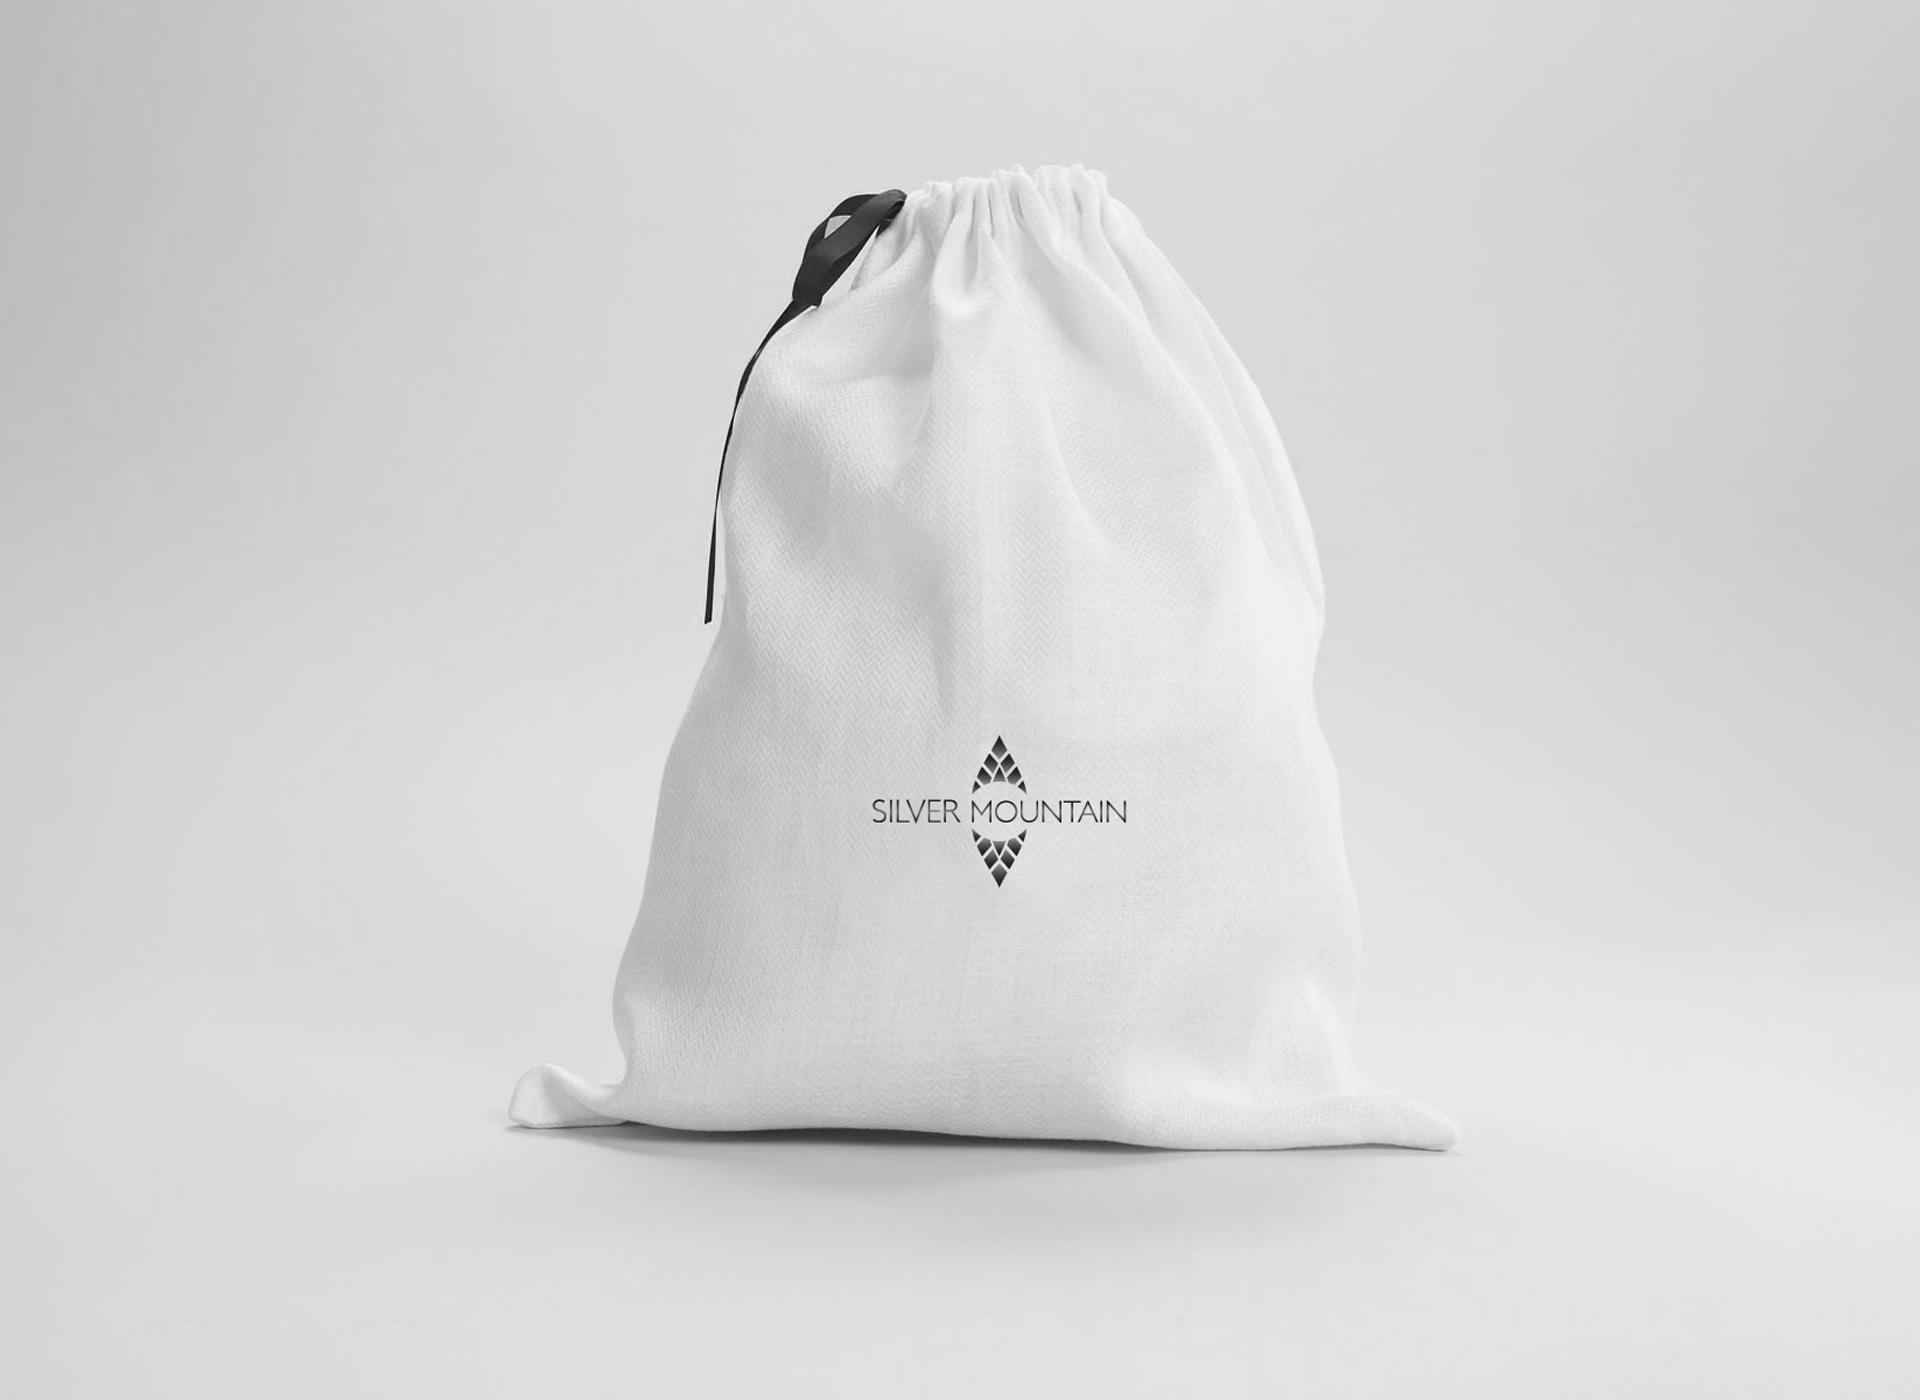 Silver Mountain portfolio inoveo bag